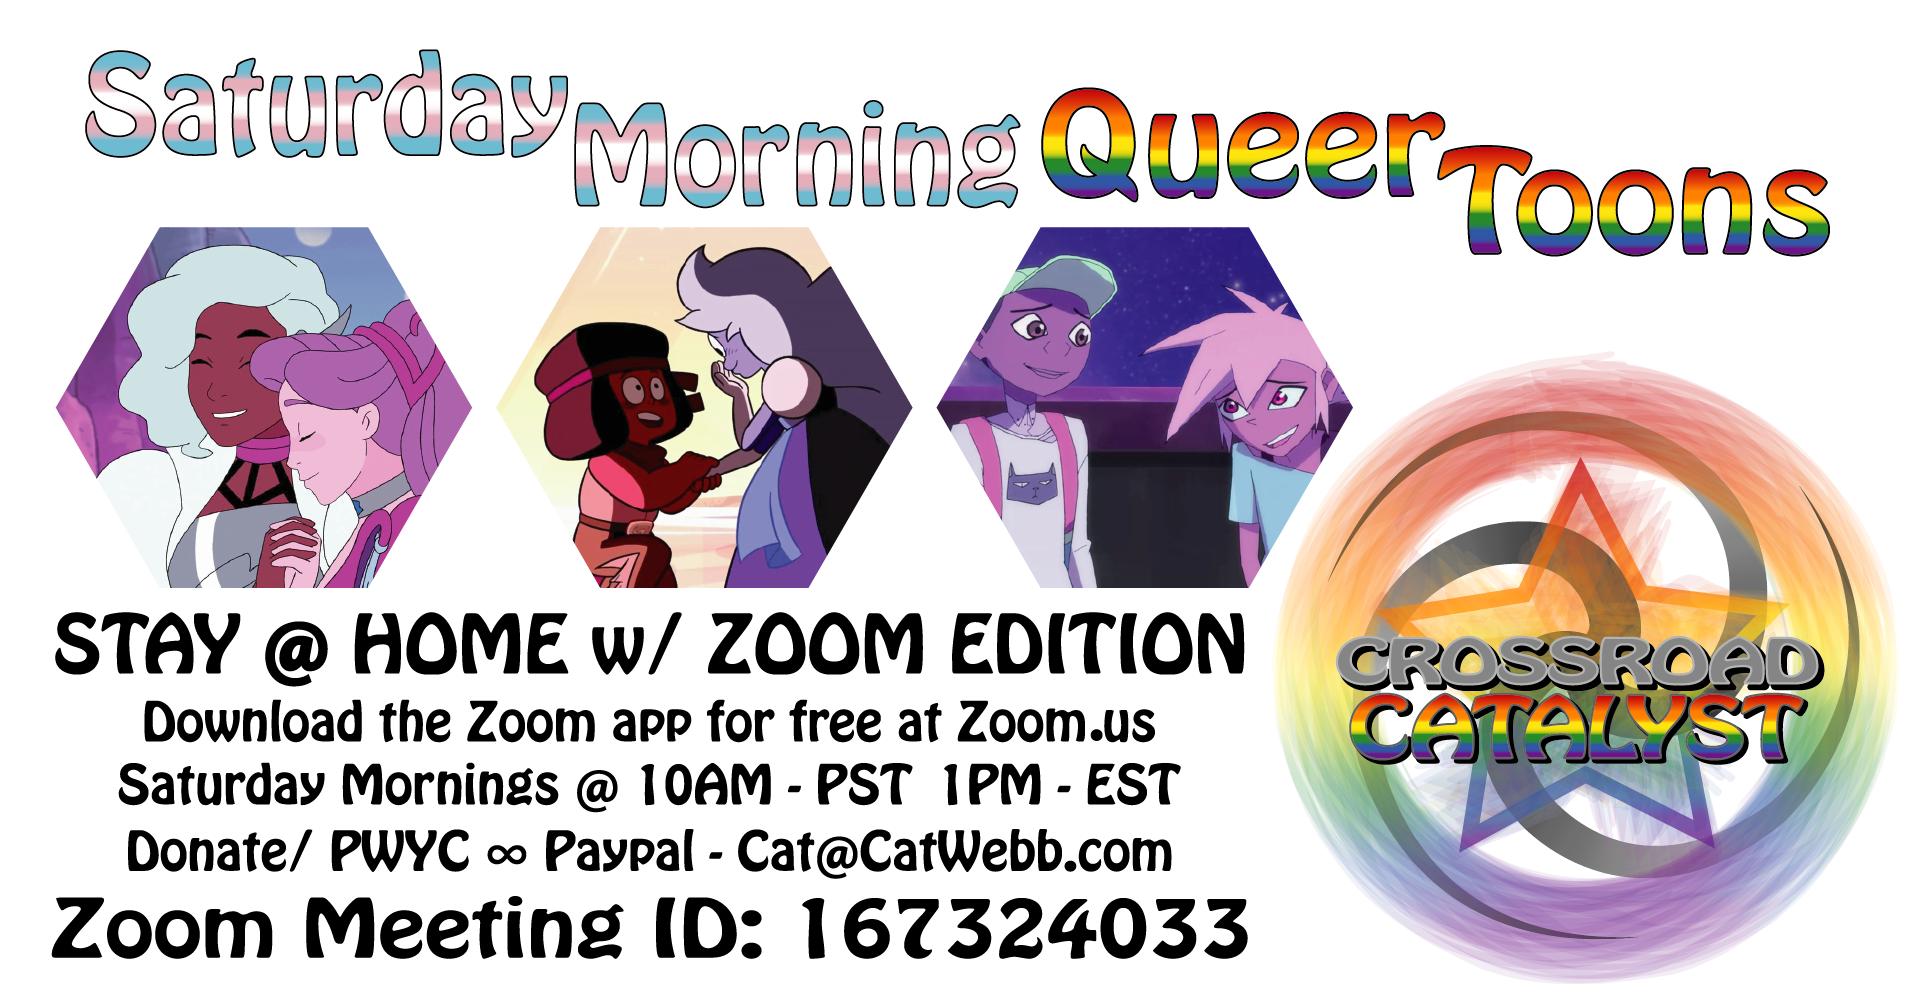 Saturday Morning QueerToons / ZOOM Edition